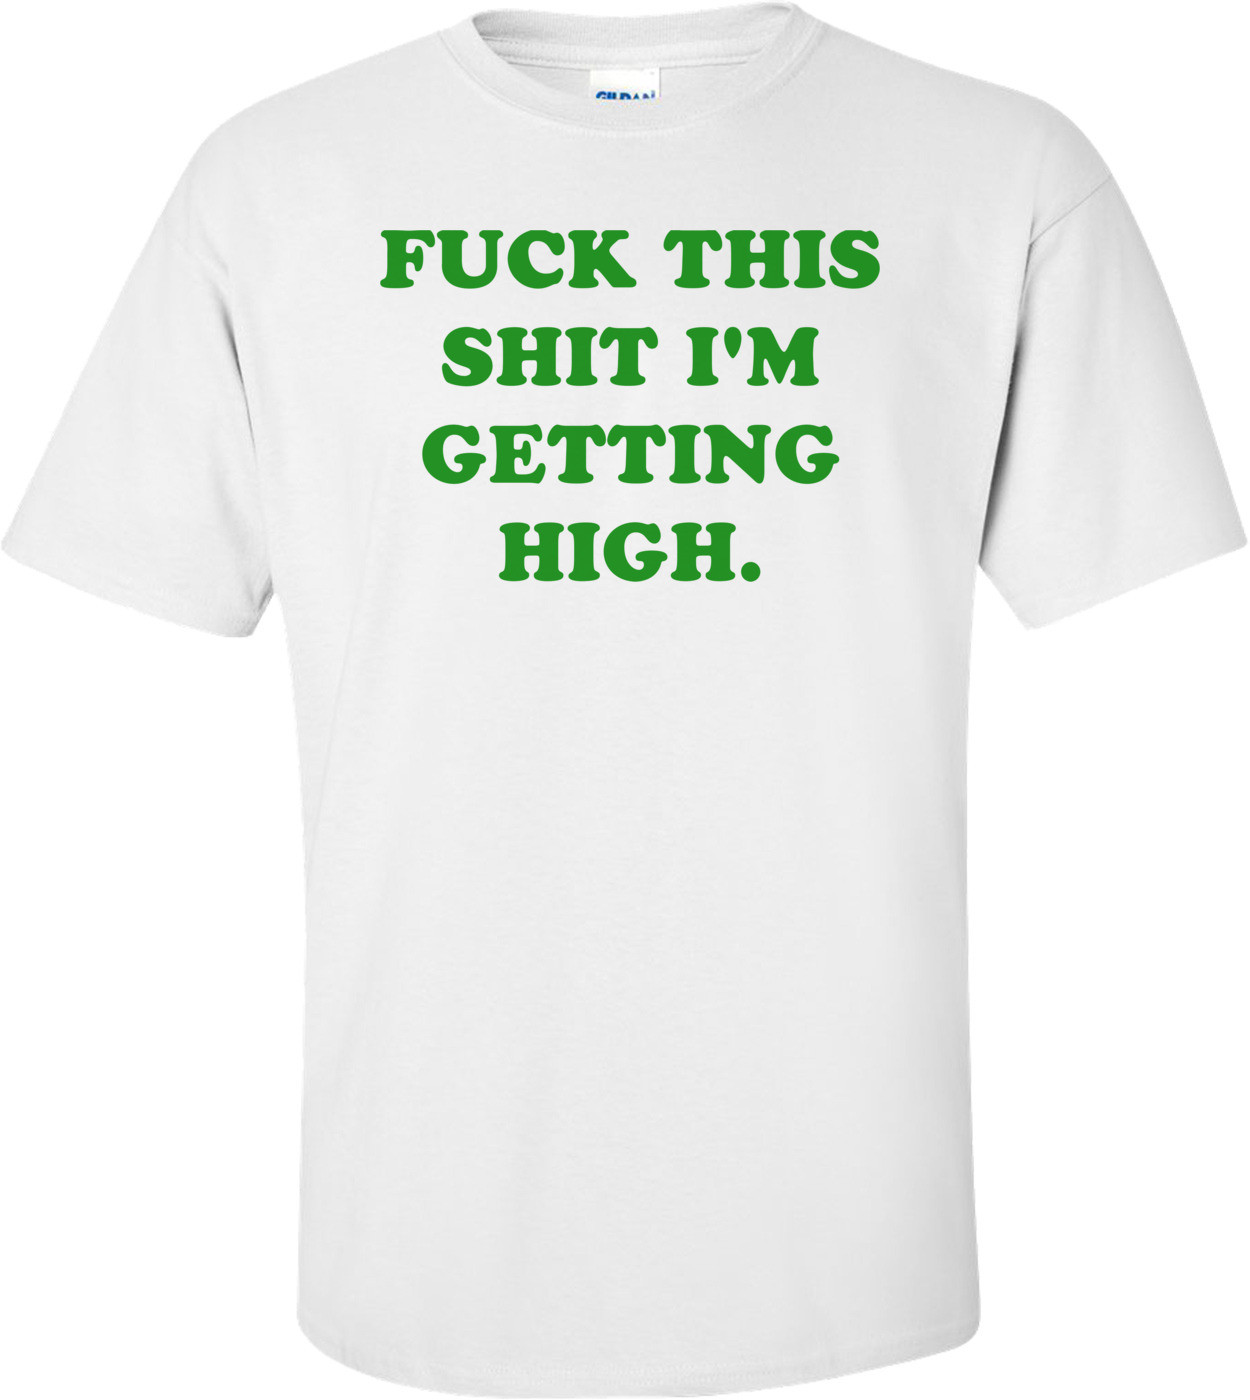 FUCK THIS SHIT I'M GETTING HIGH. Shirt